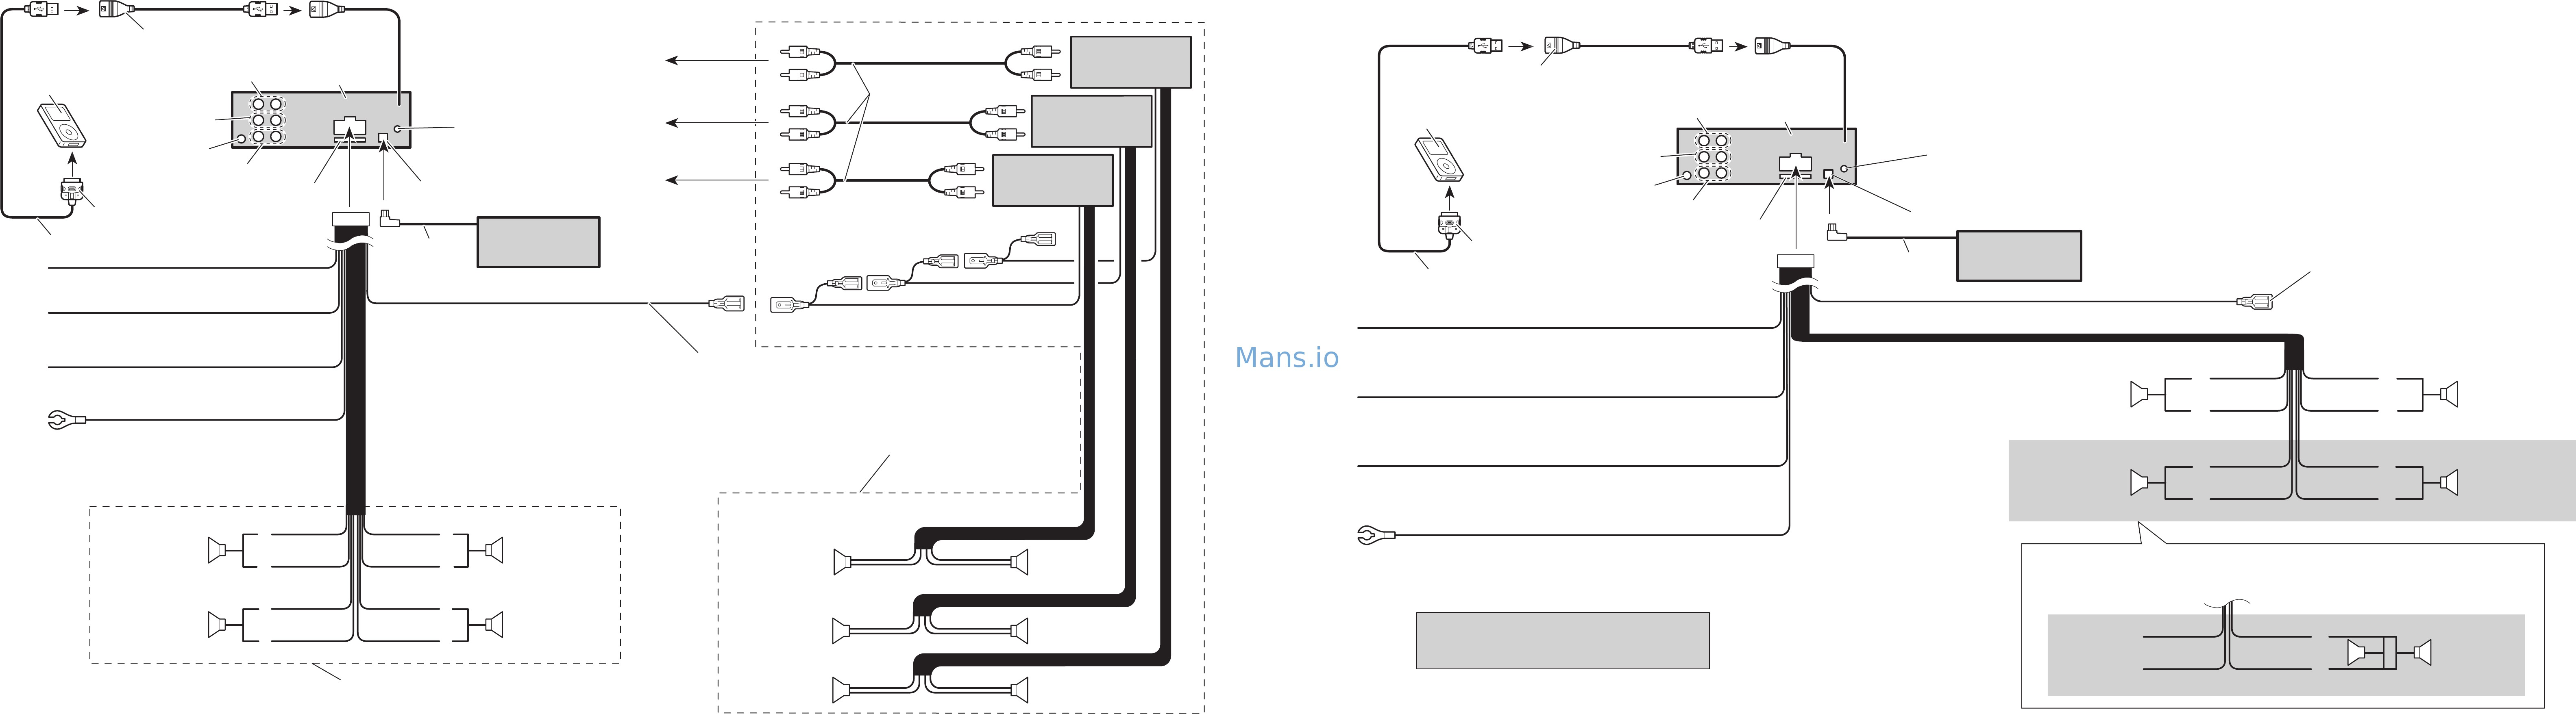 Pioneer Radio Wiring Diagram from mainetreasurechest.com